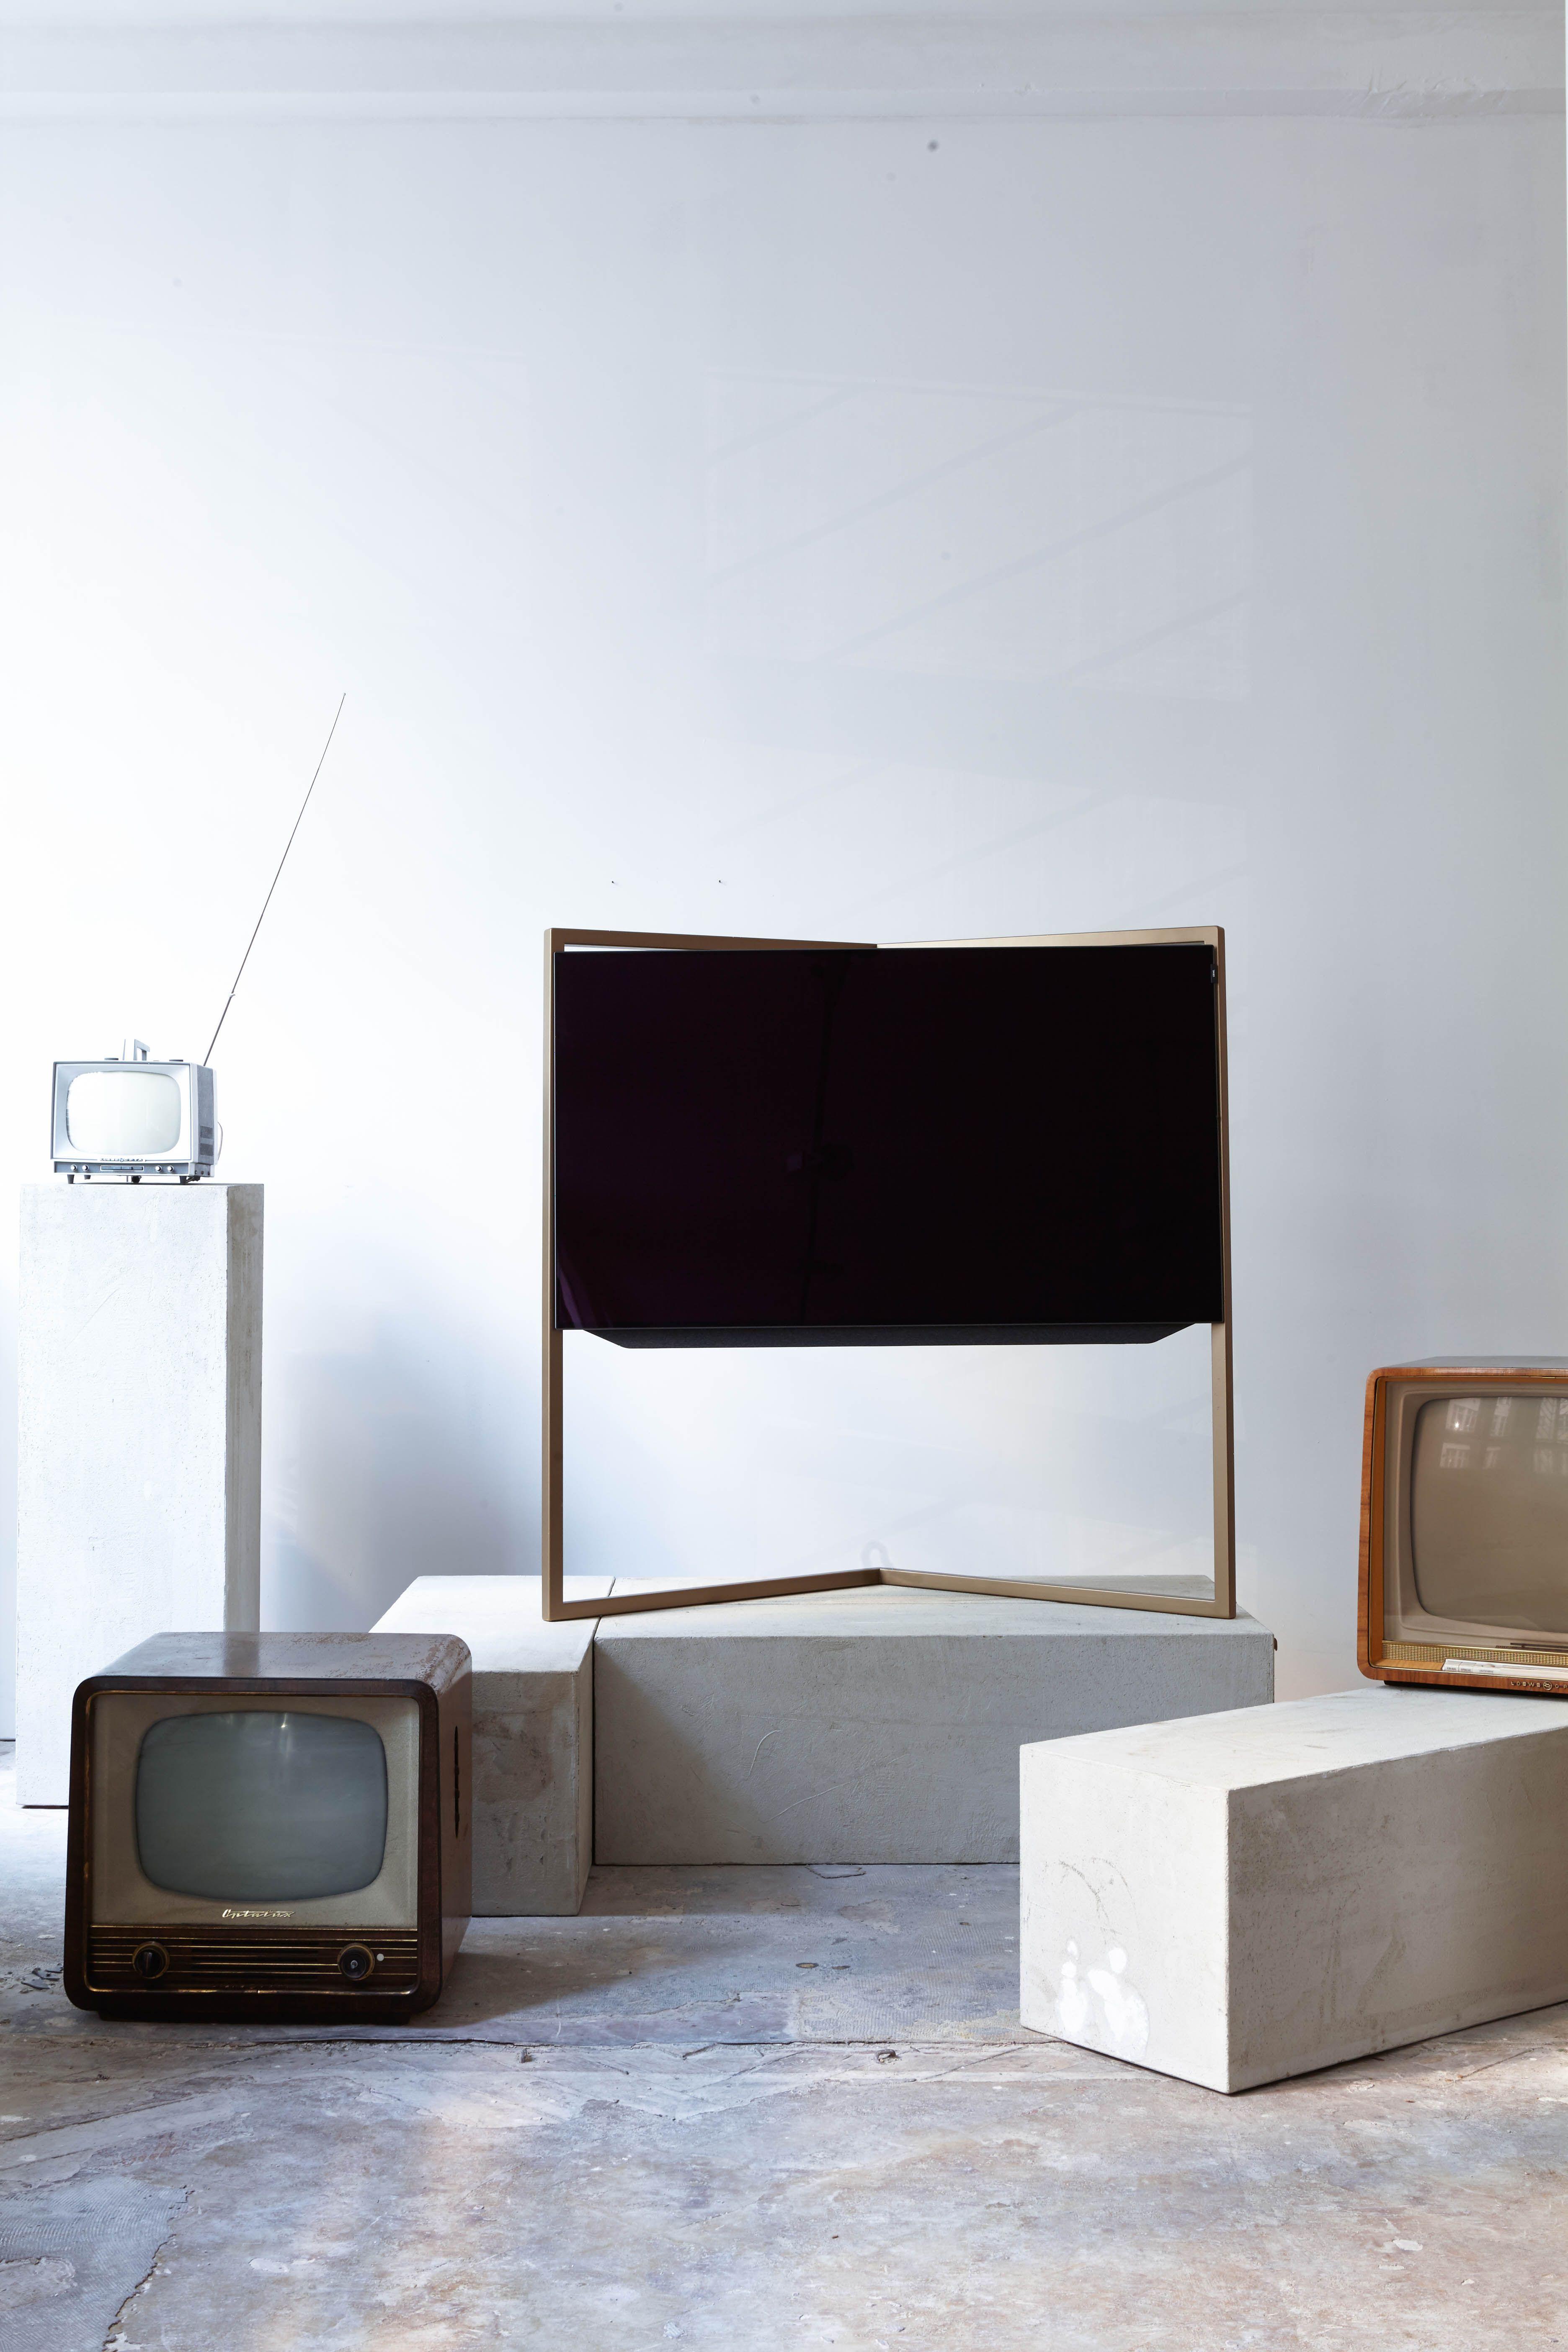 Bild 9 Loewe TV at Loewe Raum #tv #interior #gold #frame #loewetv ...